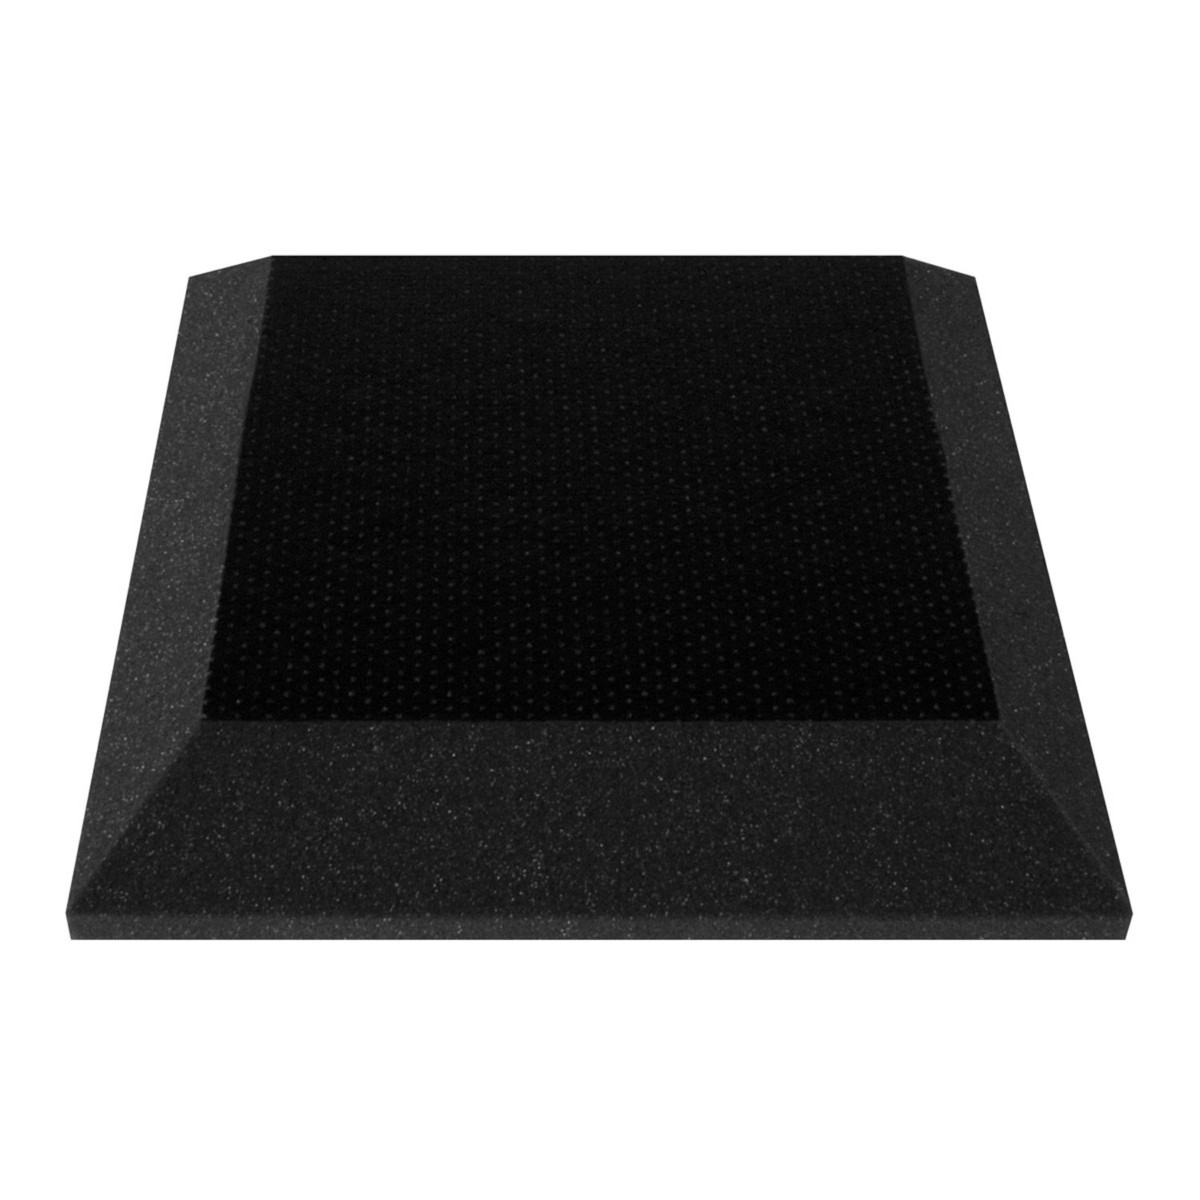 ultime acoustique biseau studio mousse w vinyle 12 x 12. Black Bedroom Furniture Sets. Home Design Ideas